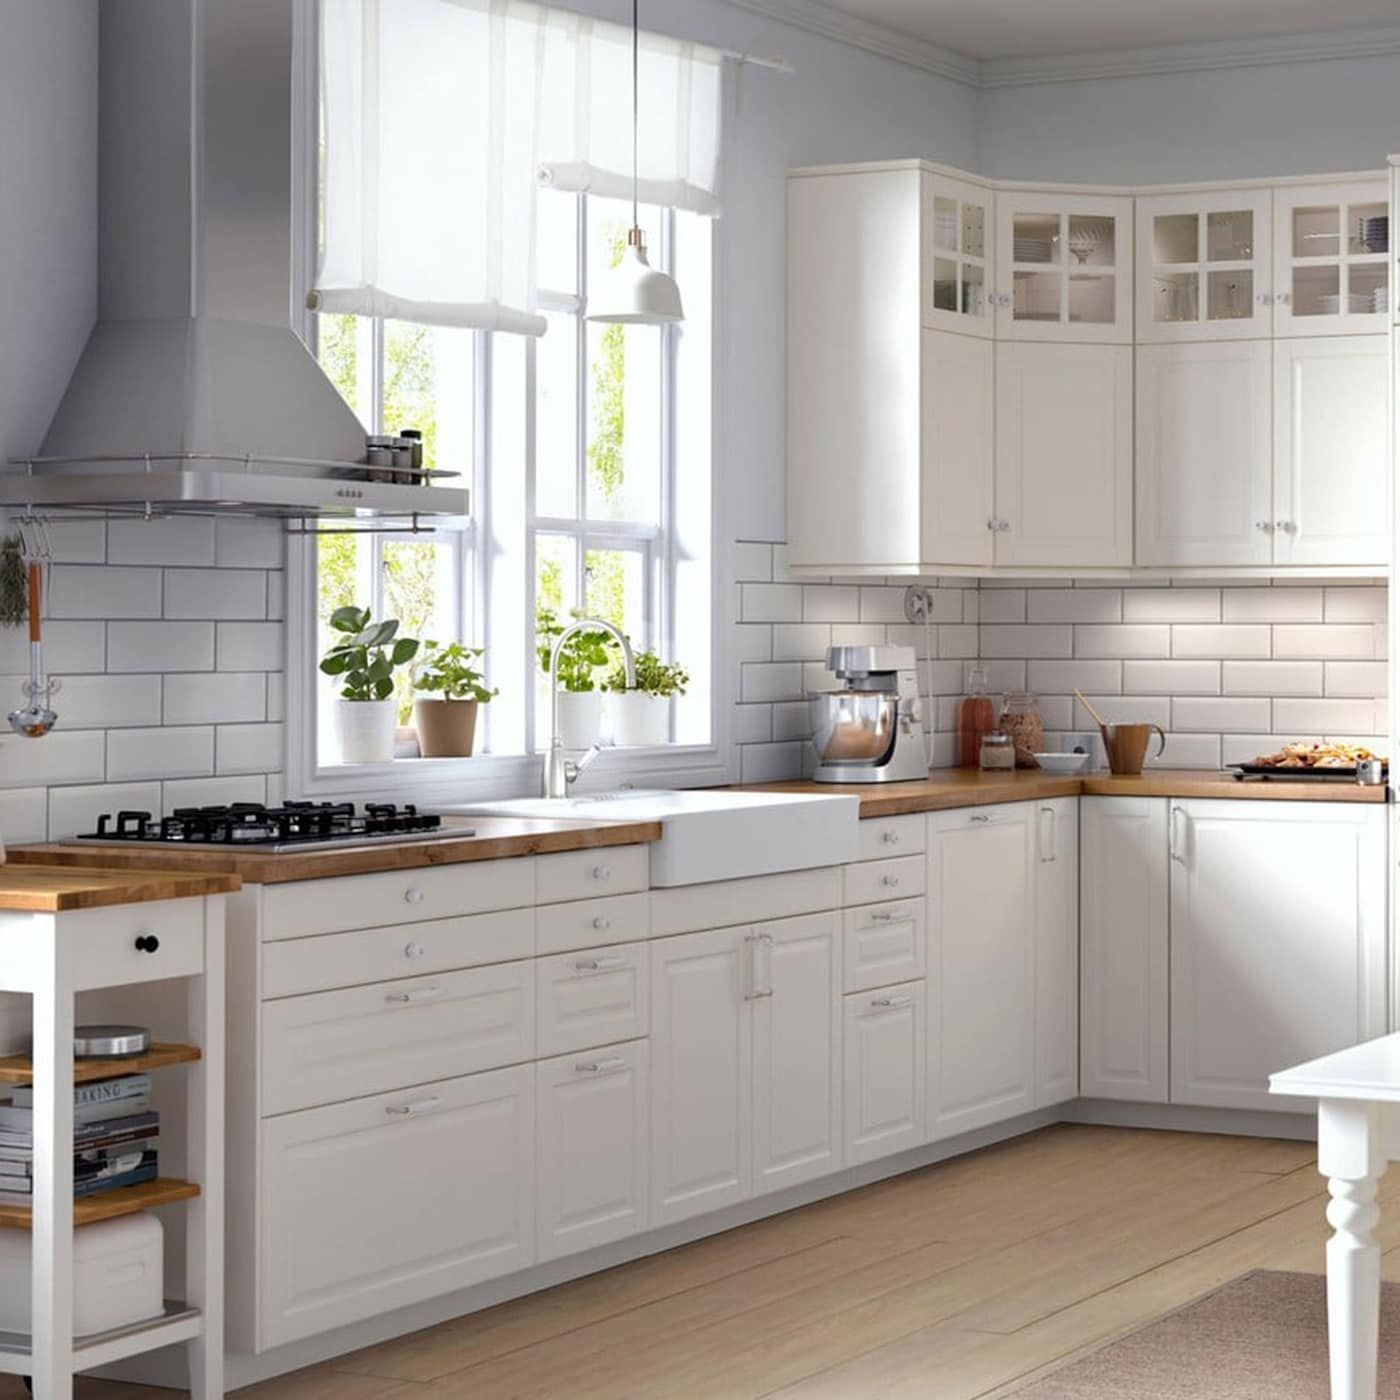 Ikea Kitchen Design 2020